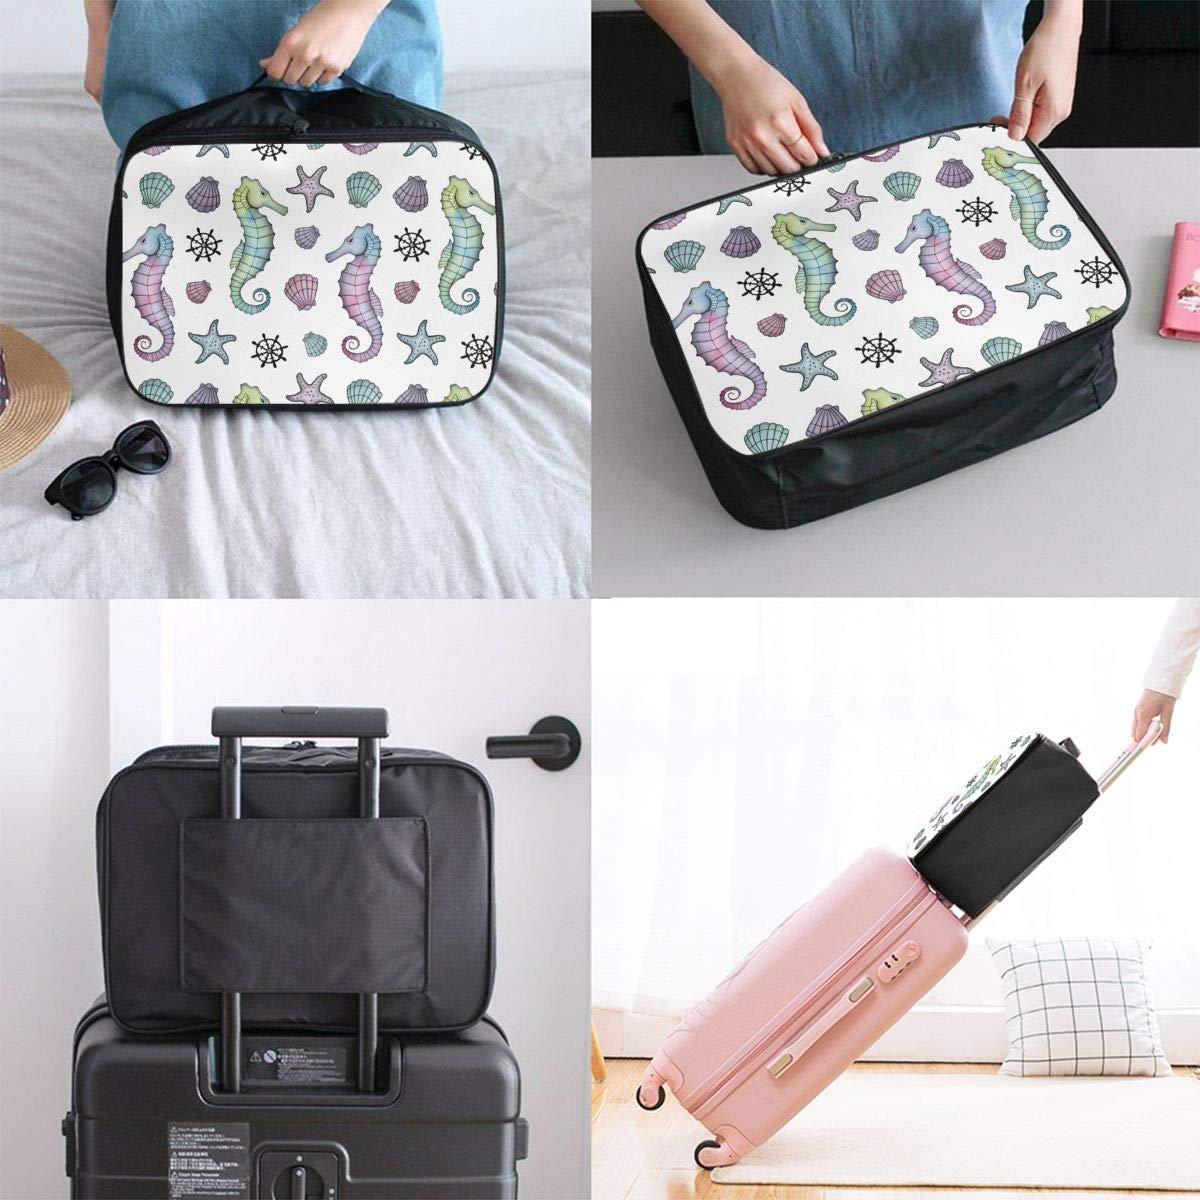 Travel Duffel Bag Waterproof Fashion Lightweight Large Capacity Portable Luggage Bag Sea Horse Seashell Anchor